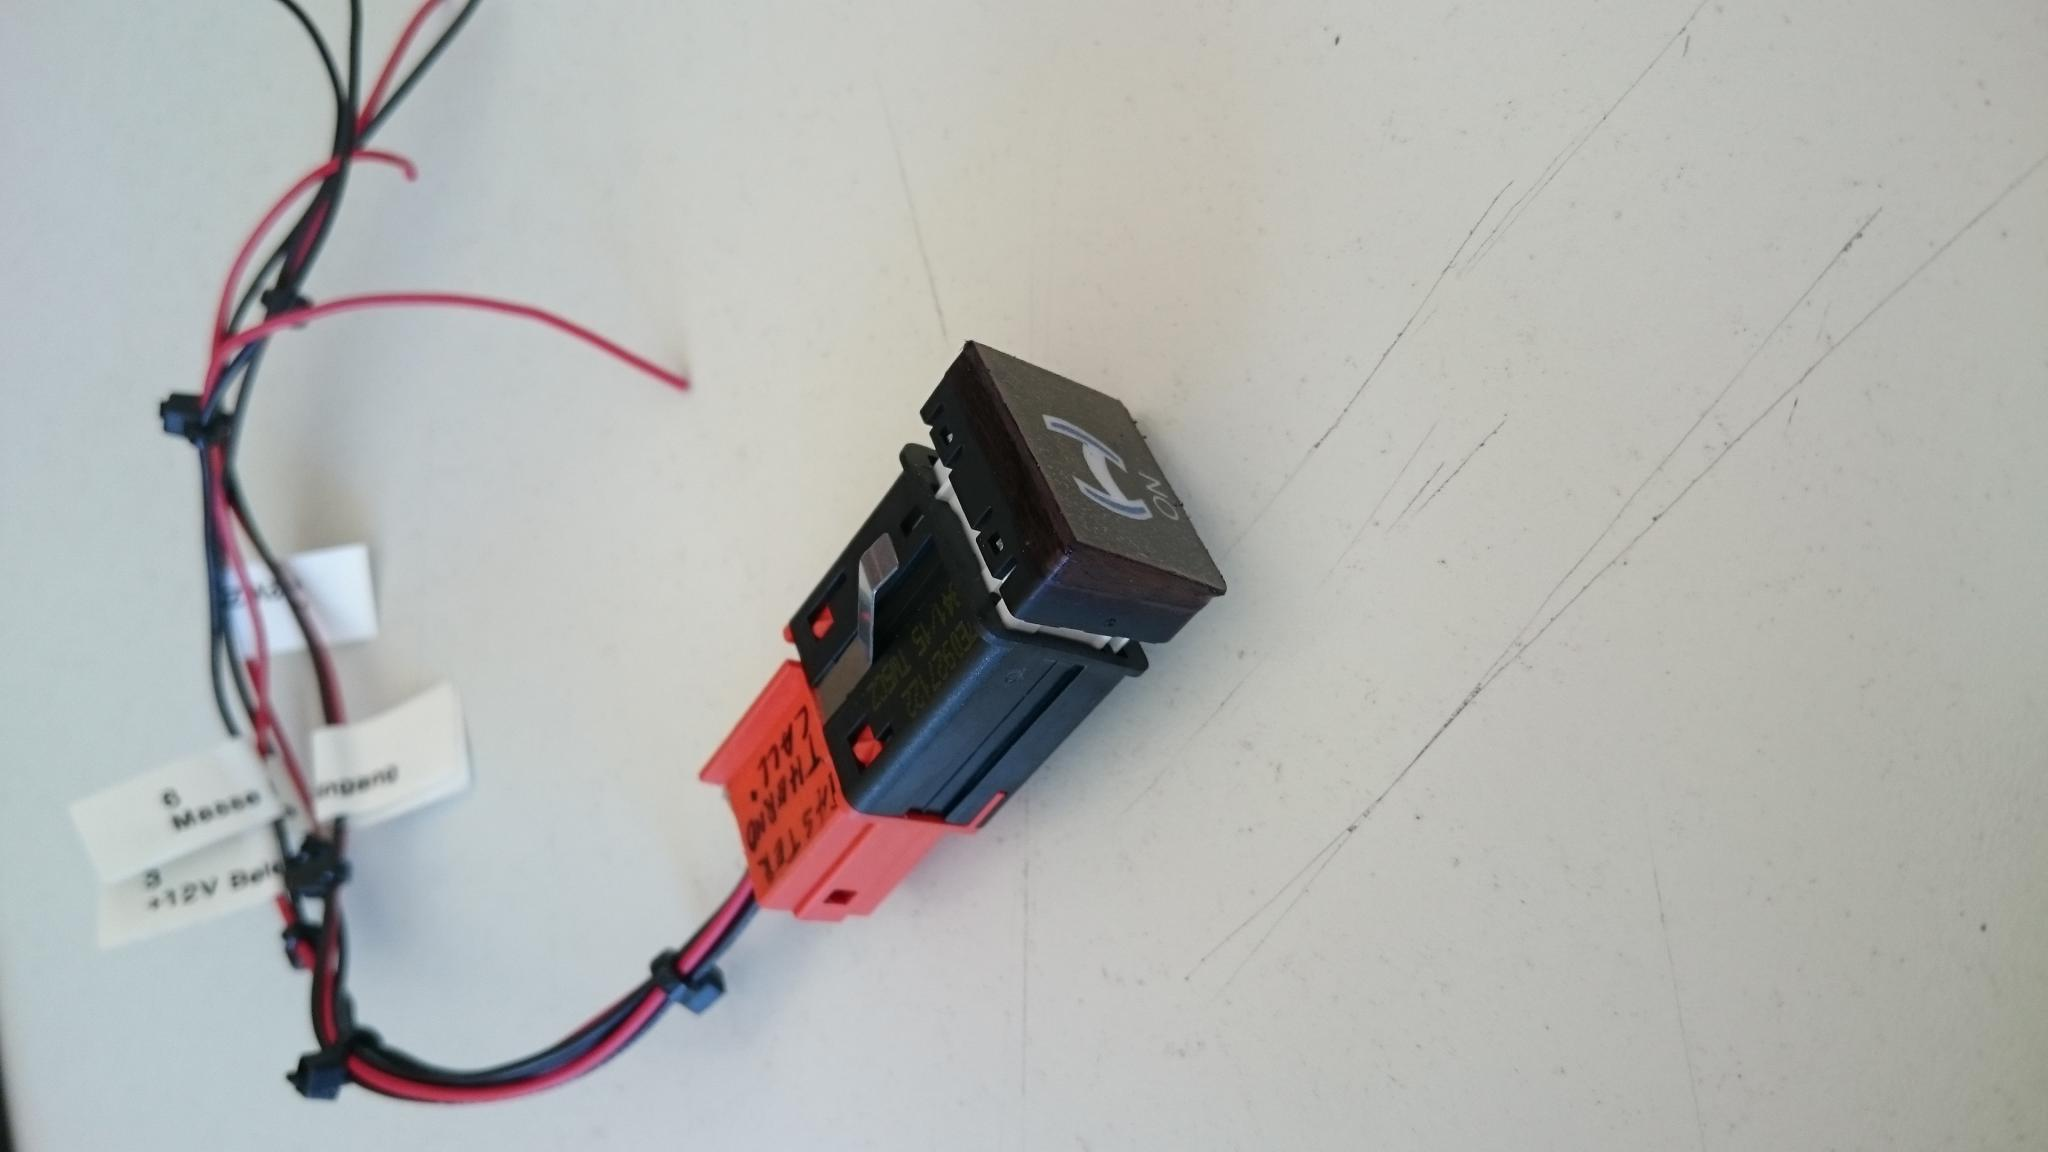 selbstgestalteter Taster/Schalter für Armaturenbrett - T6 ...